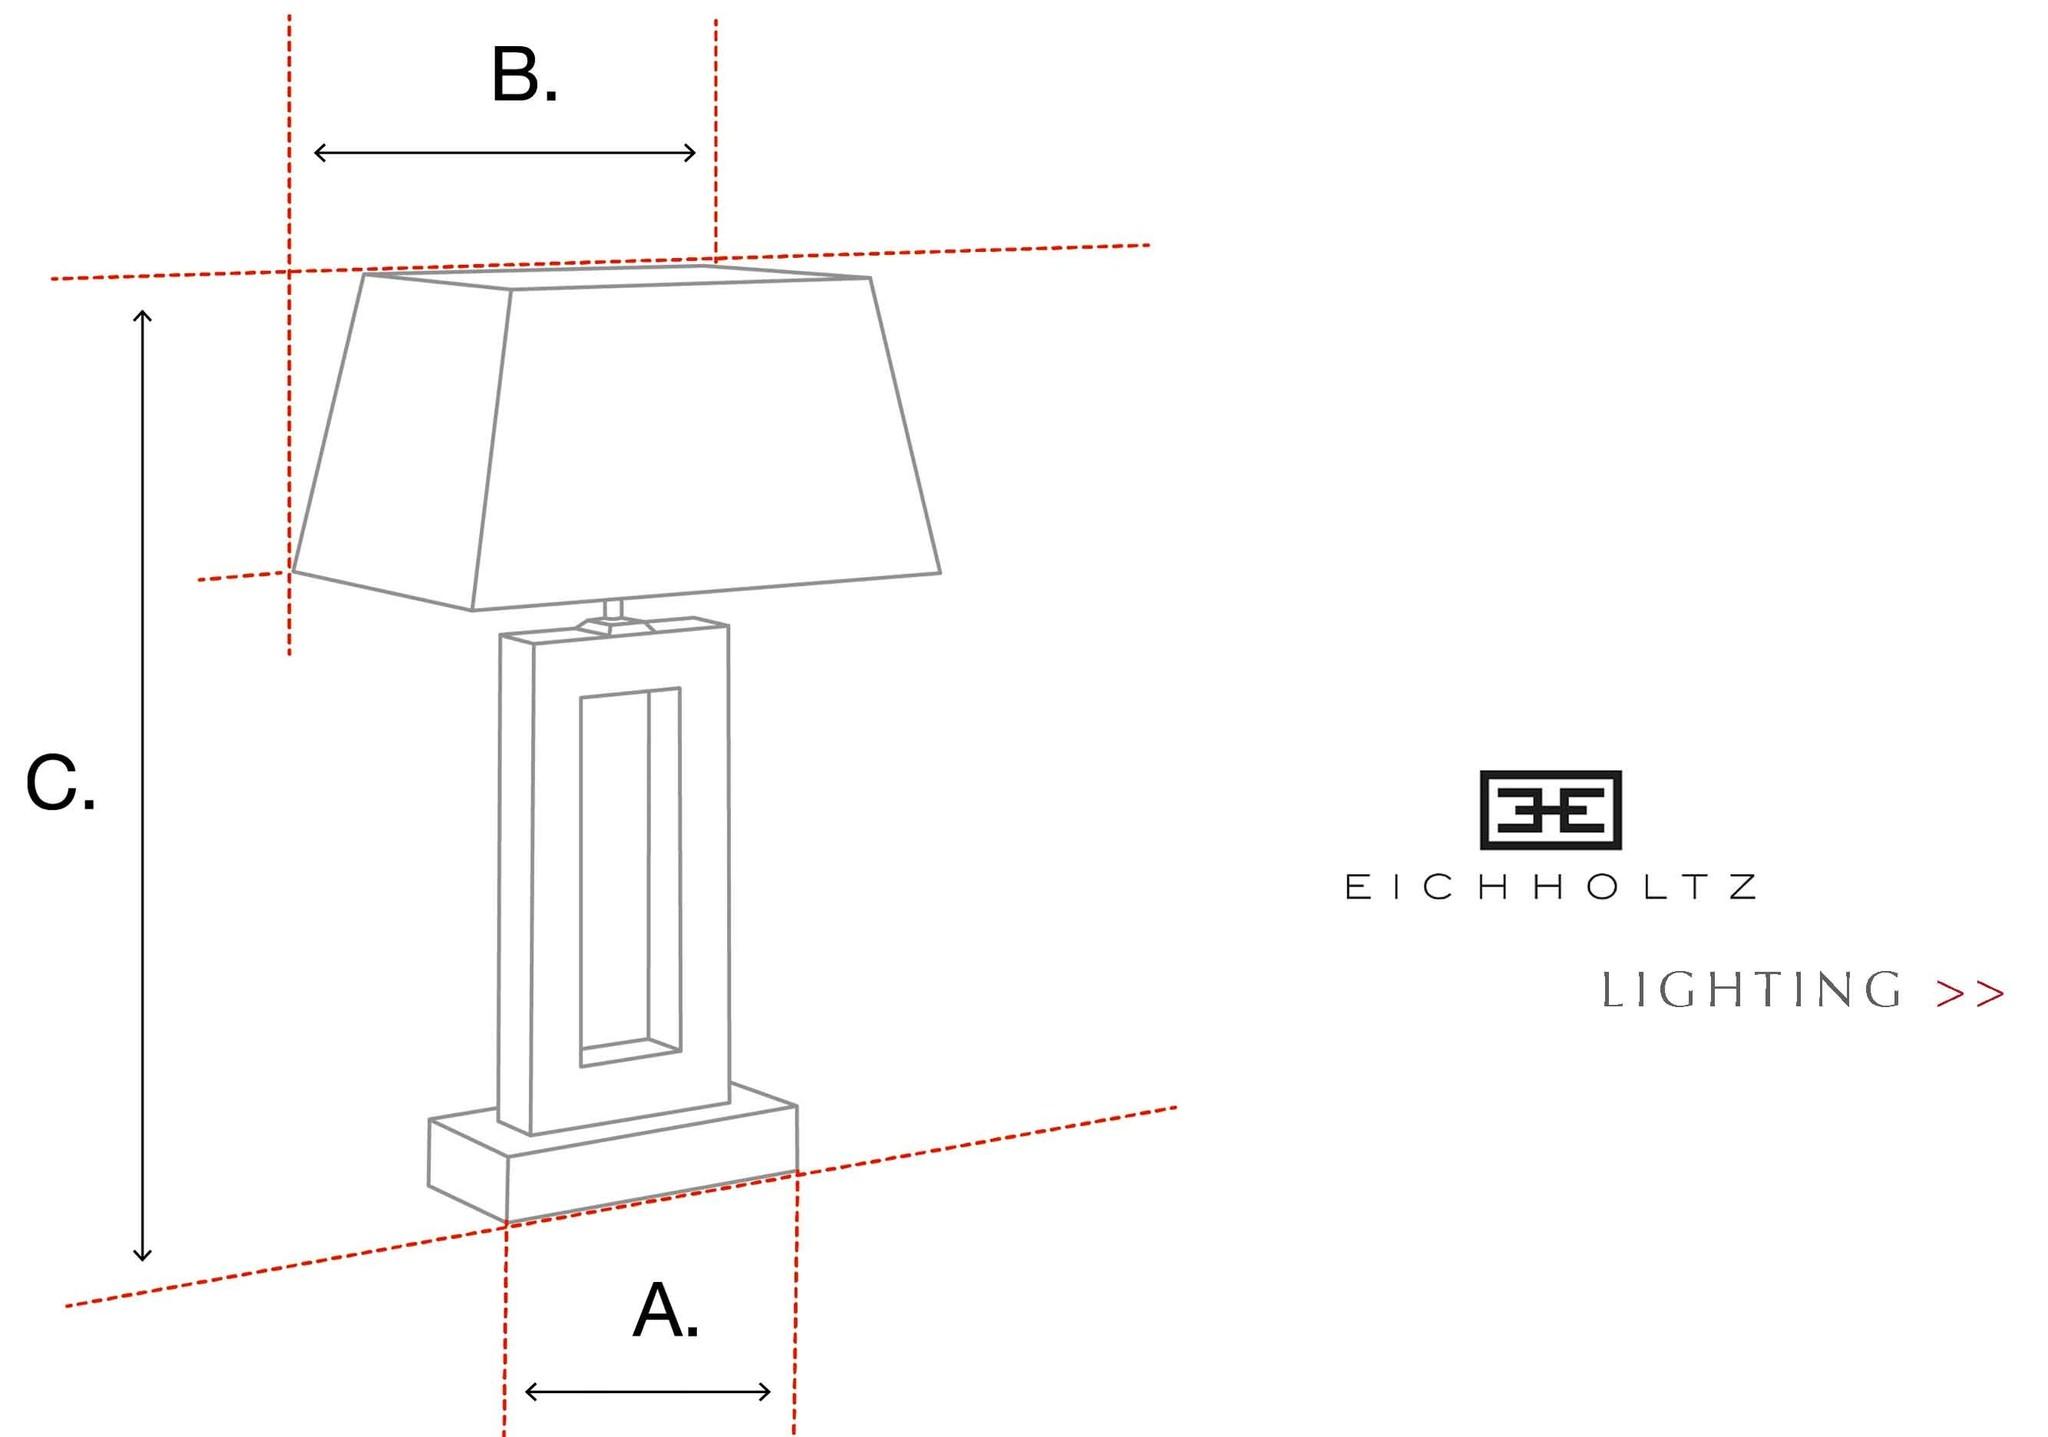 Lampen tafellampen Eichholtz formaten